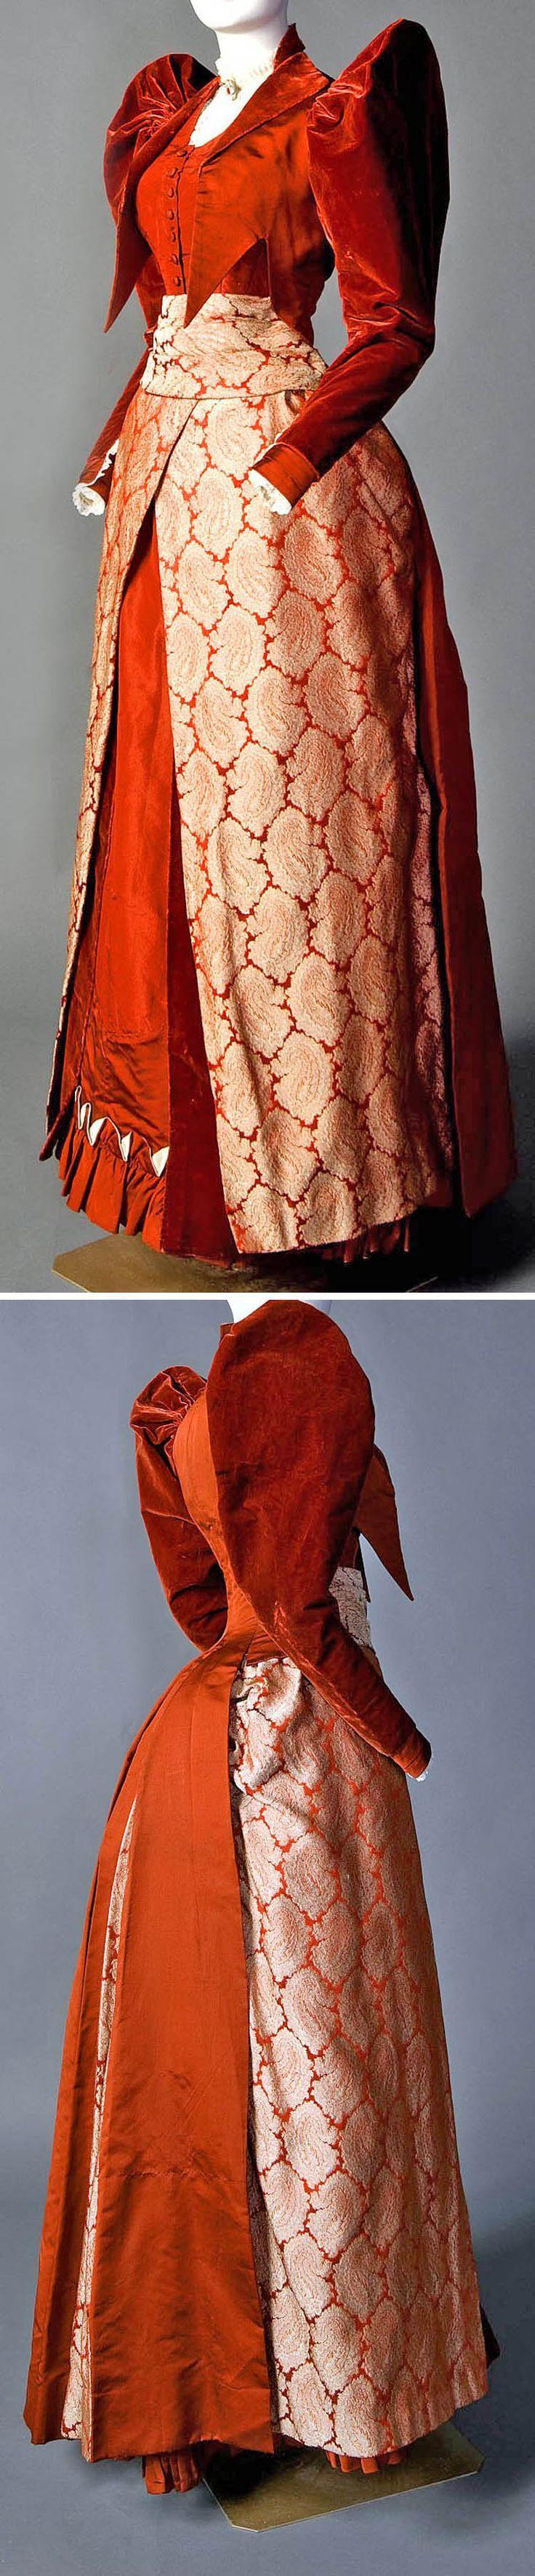 Gorgeous two-piece day dress, circa 1891-1892.